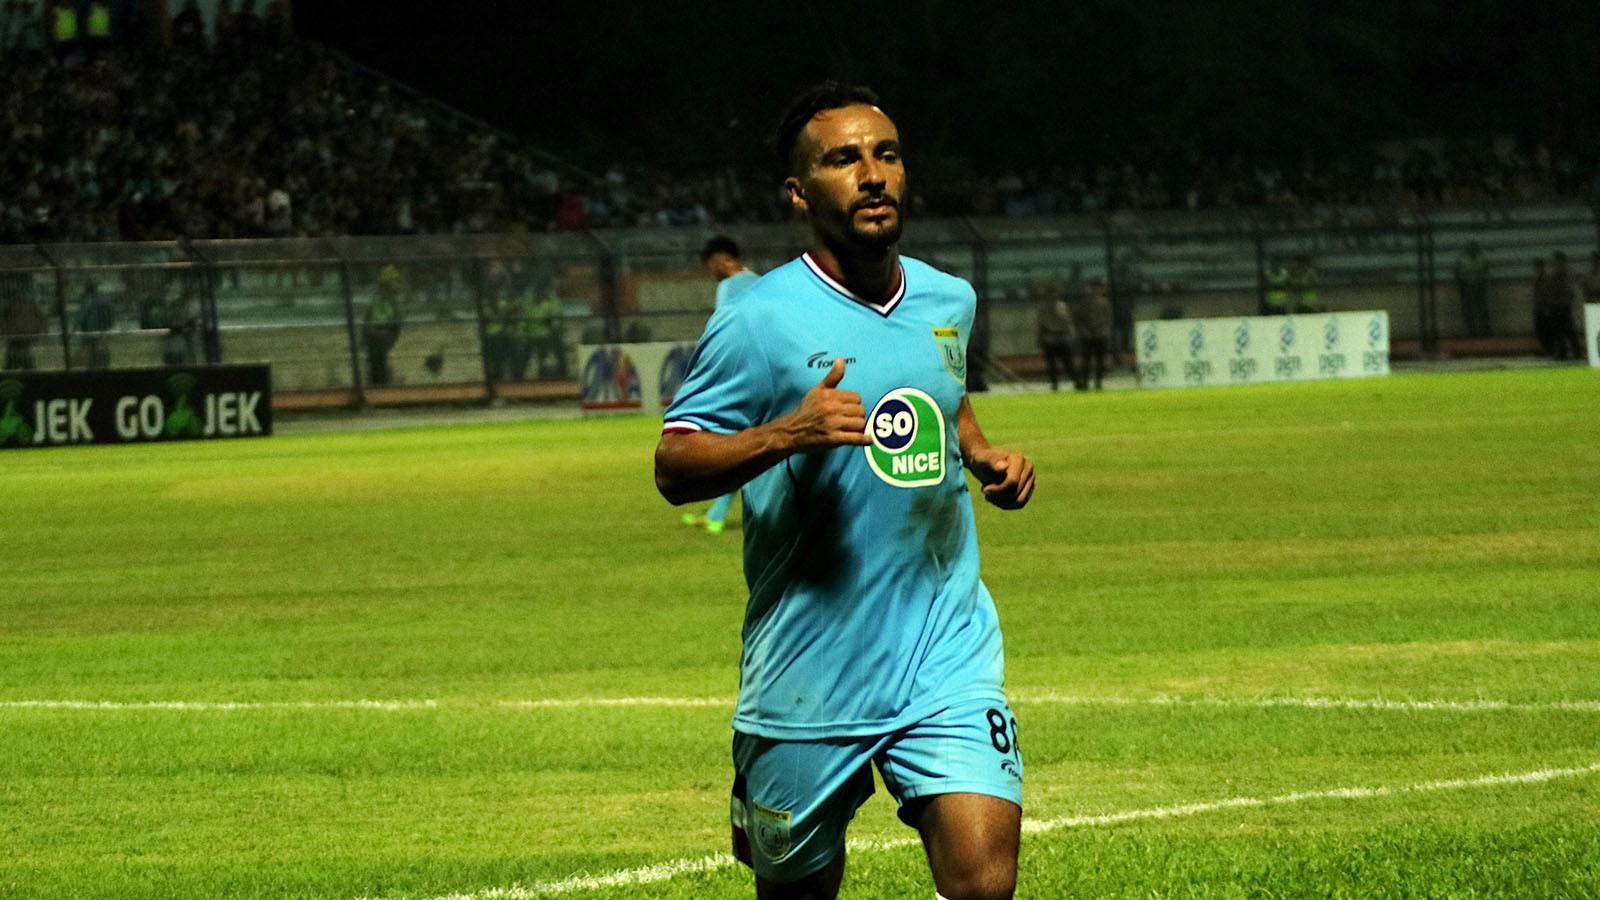 Diego Assis, gelandang serang Persela di Liga 1 2018. (Bola.com/Aditya Wany)